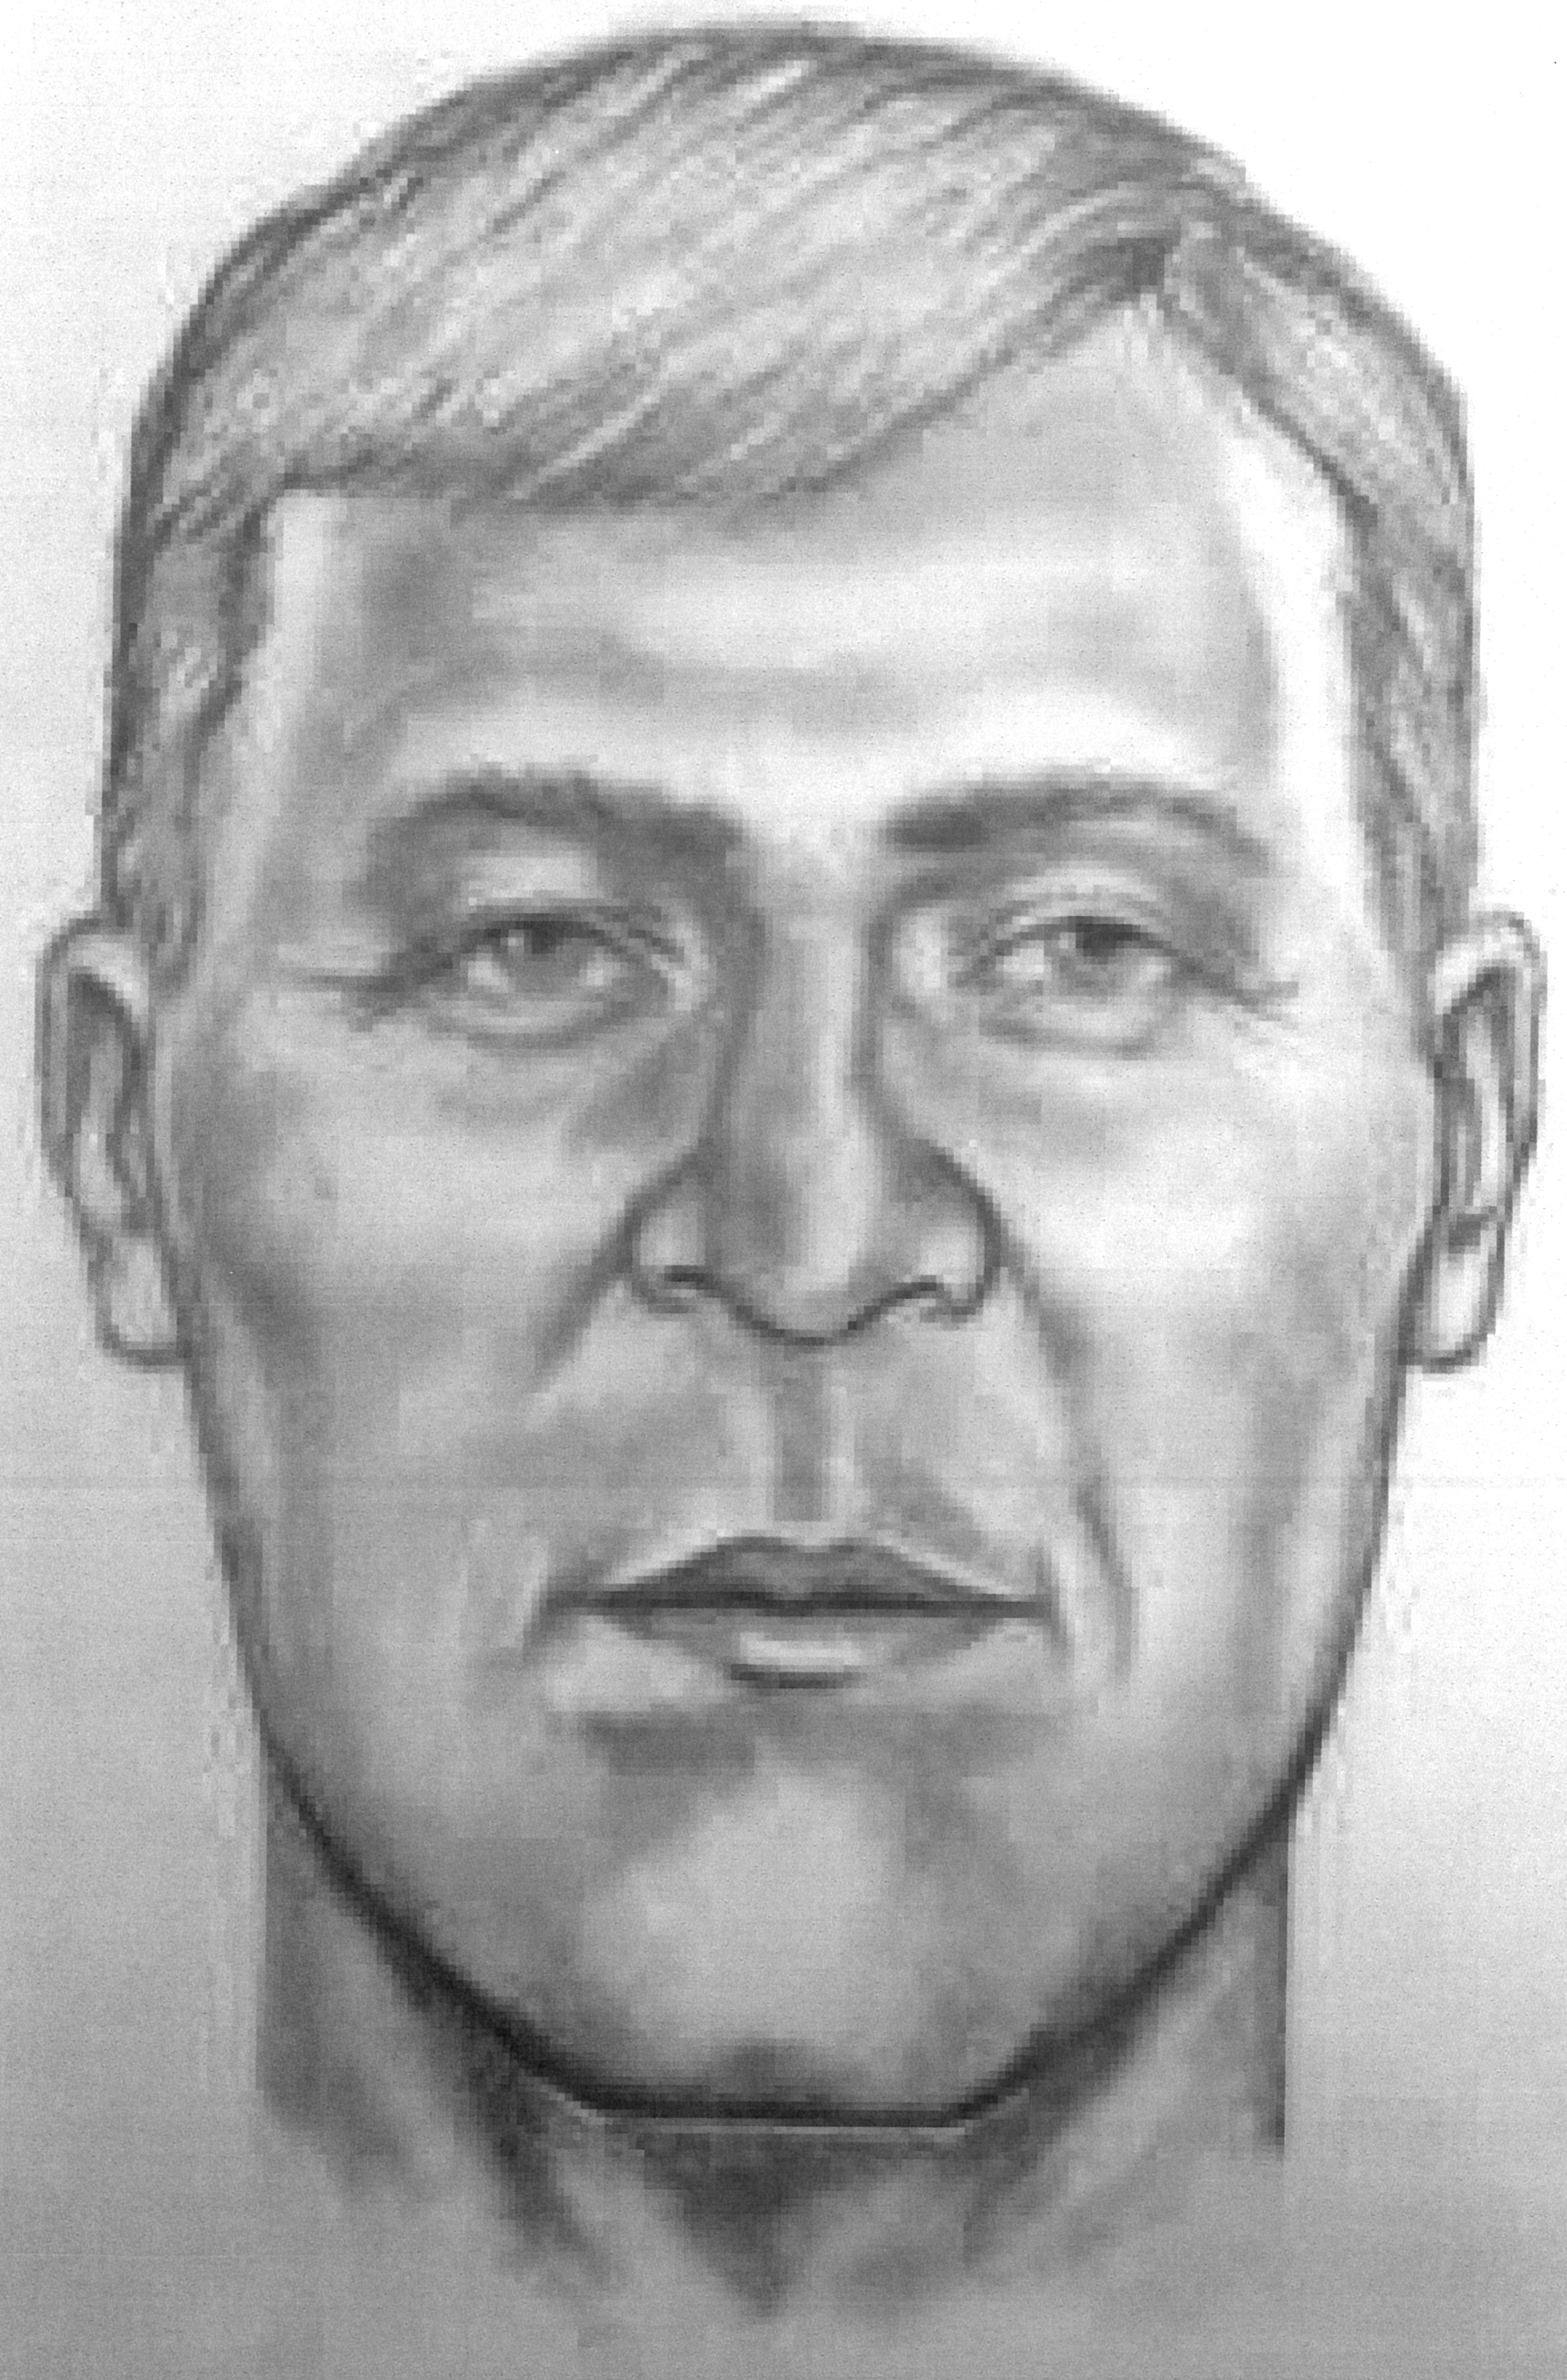 Brunswick County John Doe (2003)